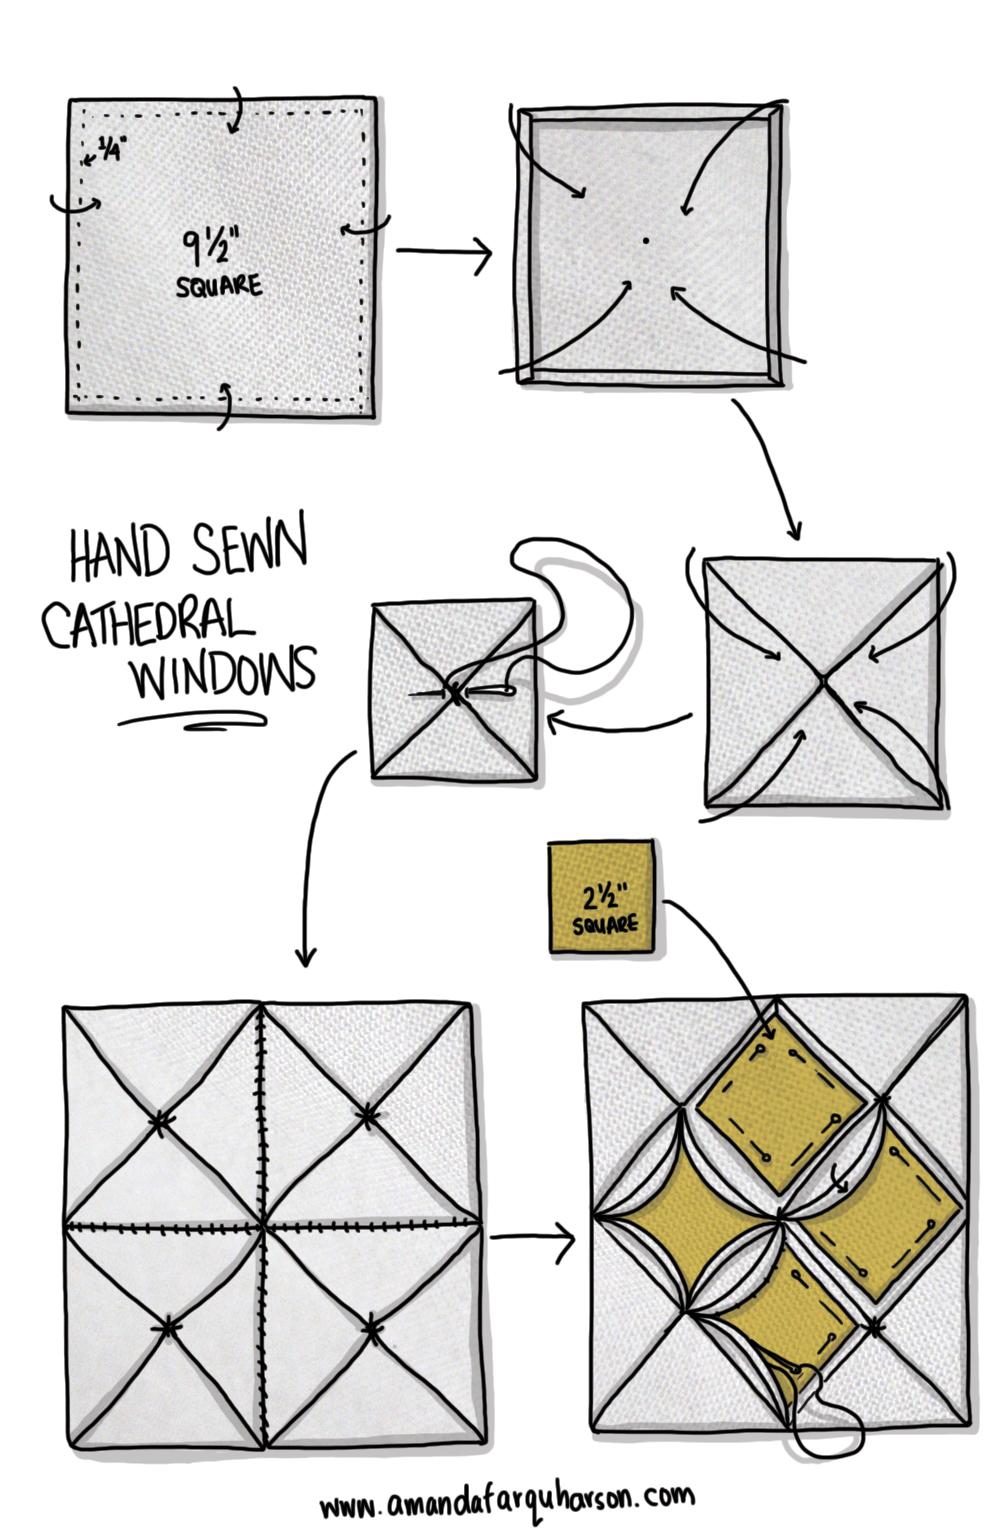 Hand Sewn Cathedral Windows Tutorial Amanda Farquharson